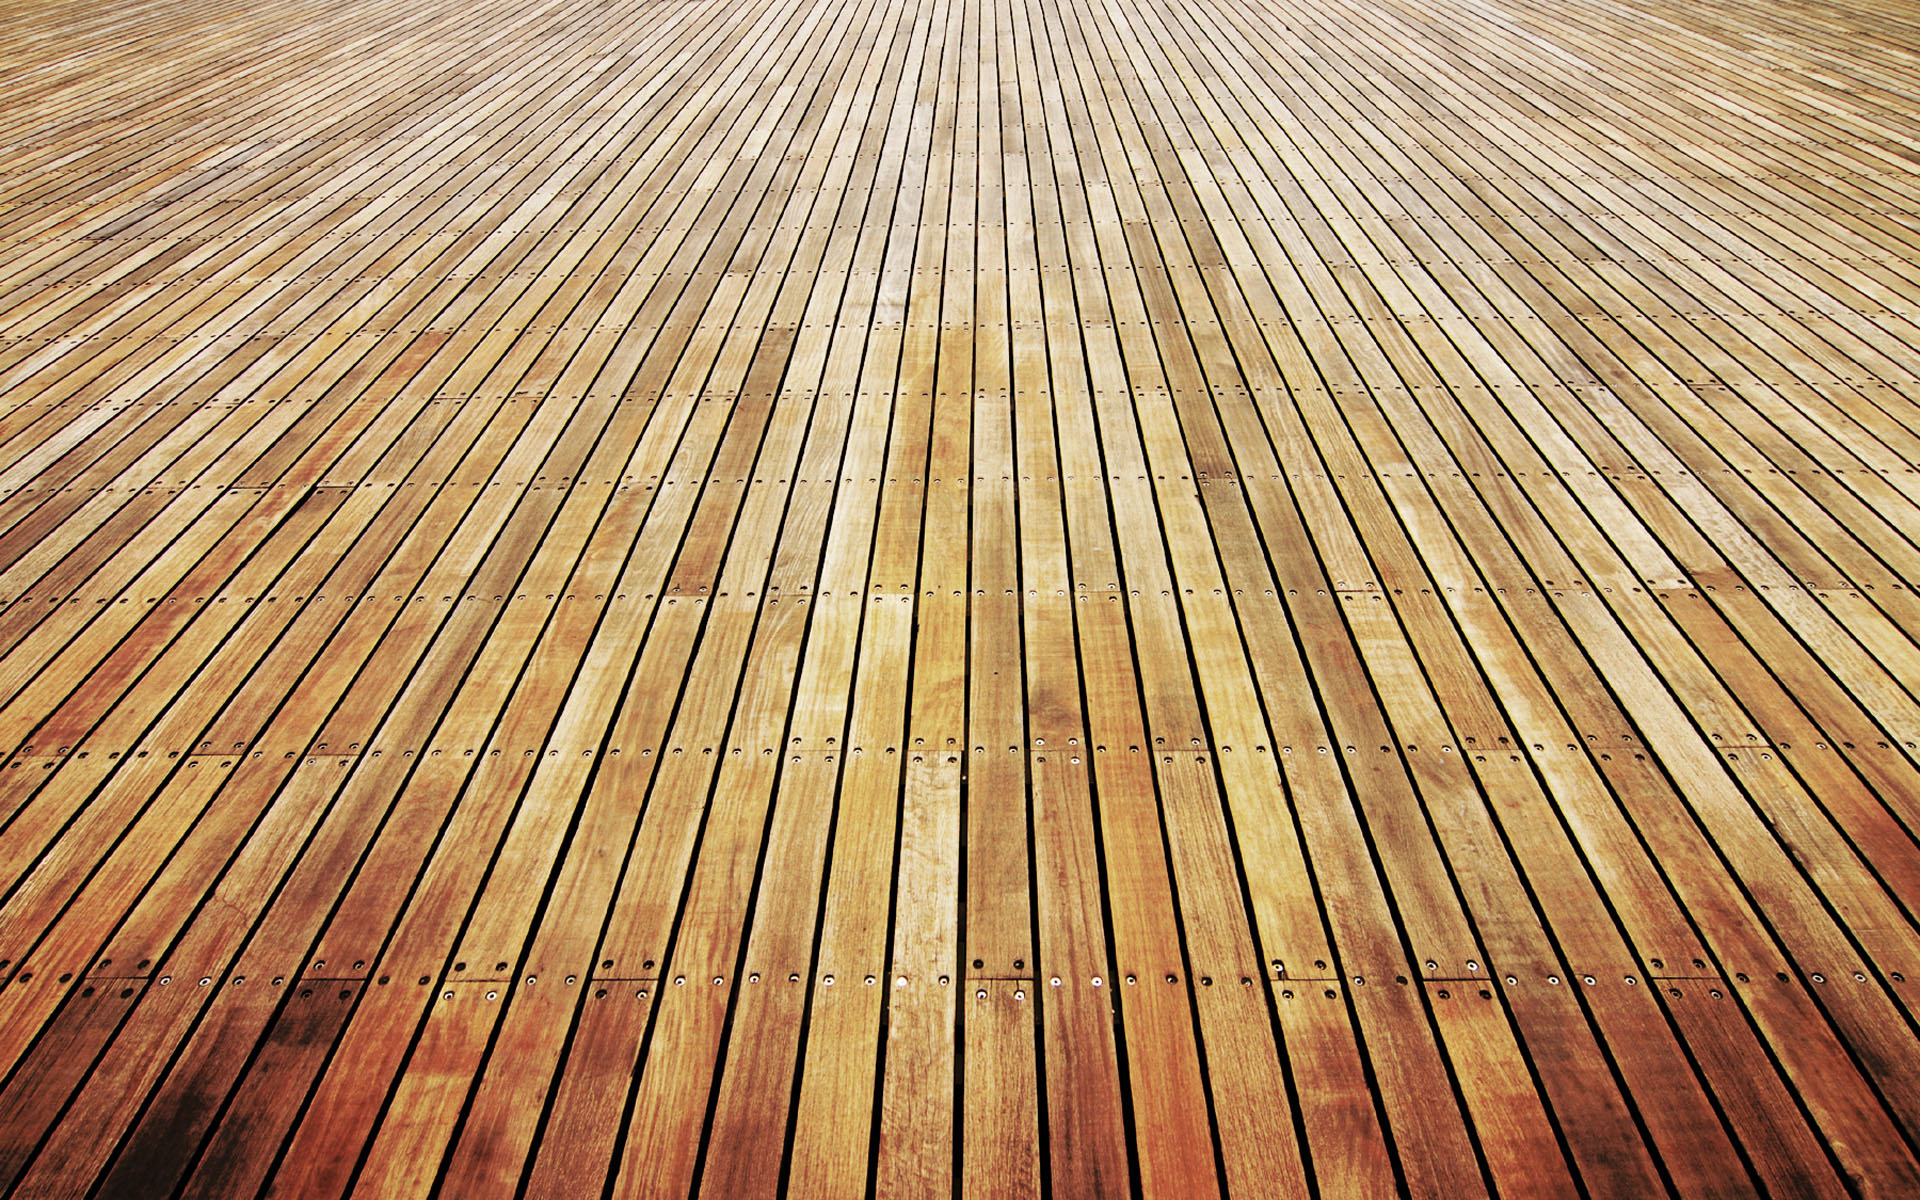 wood floor hd wallpaper wood floor hd wallpaper independent 1920x1200